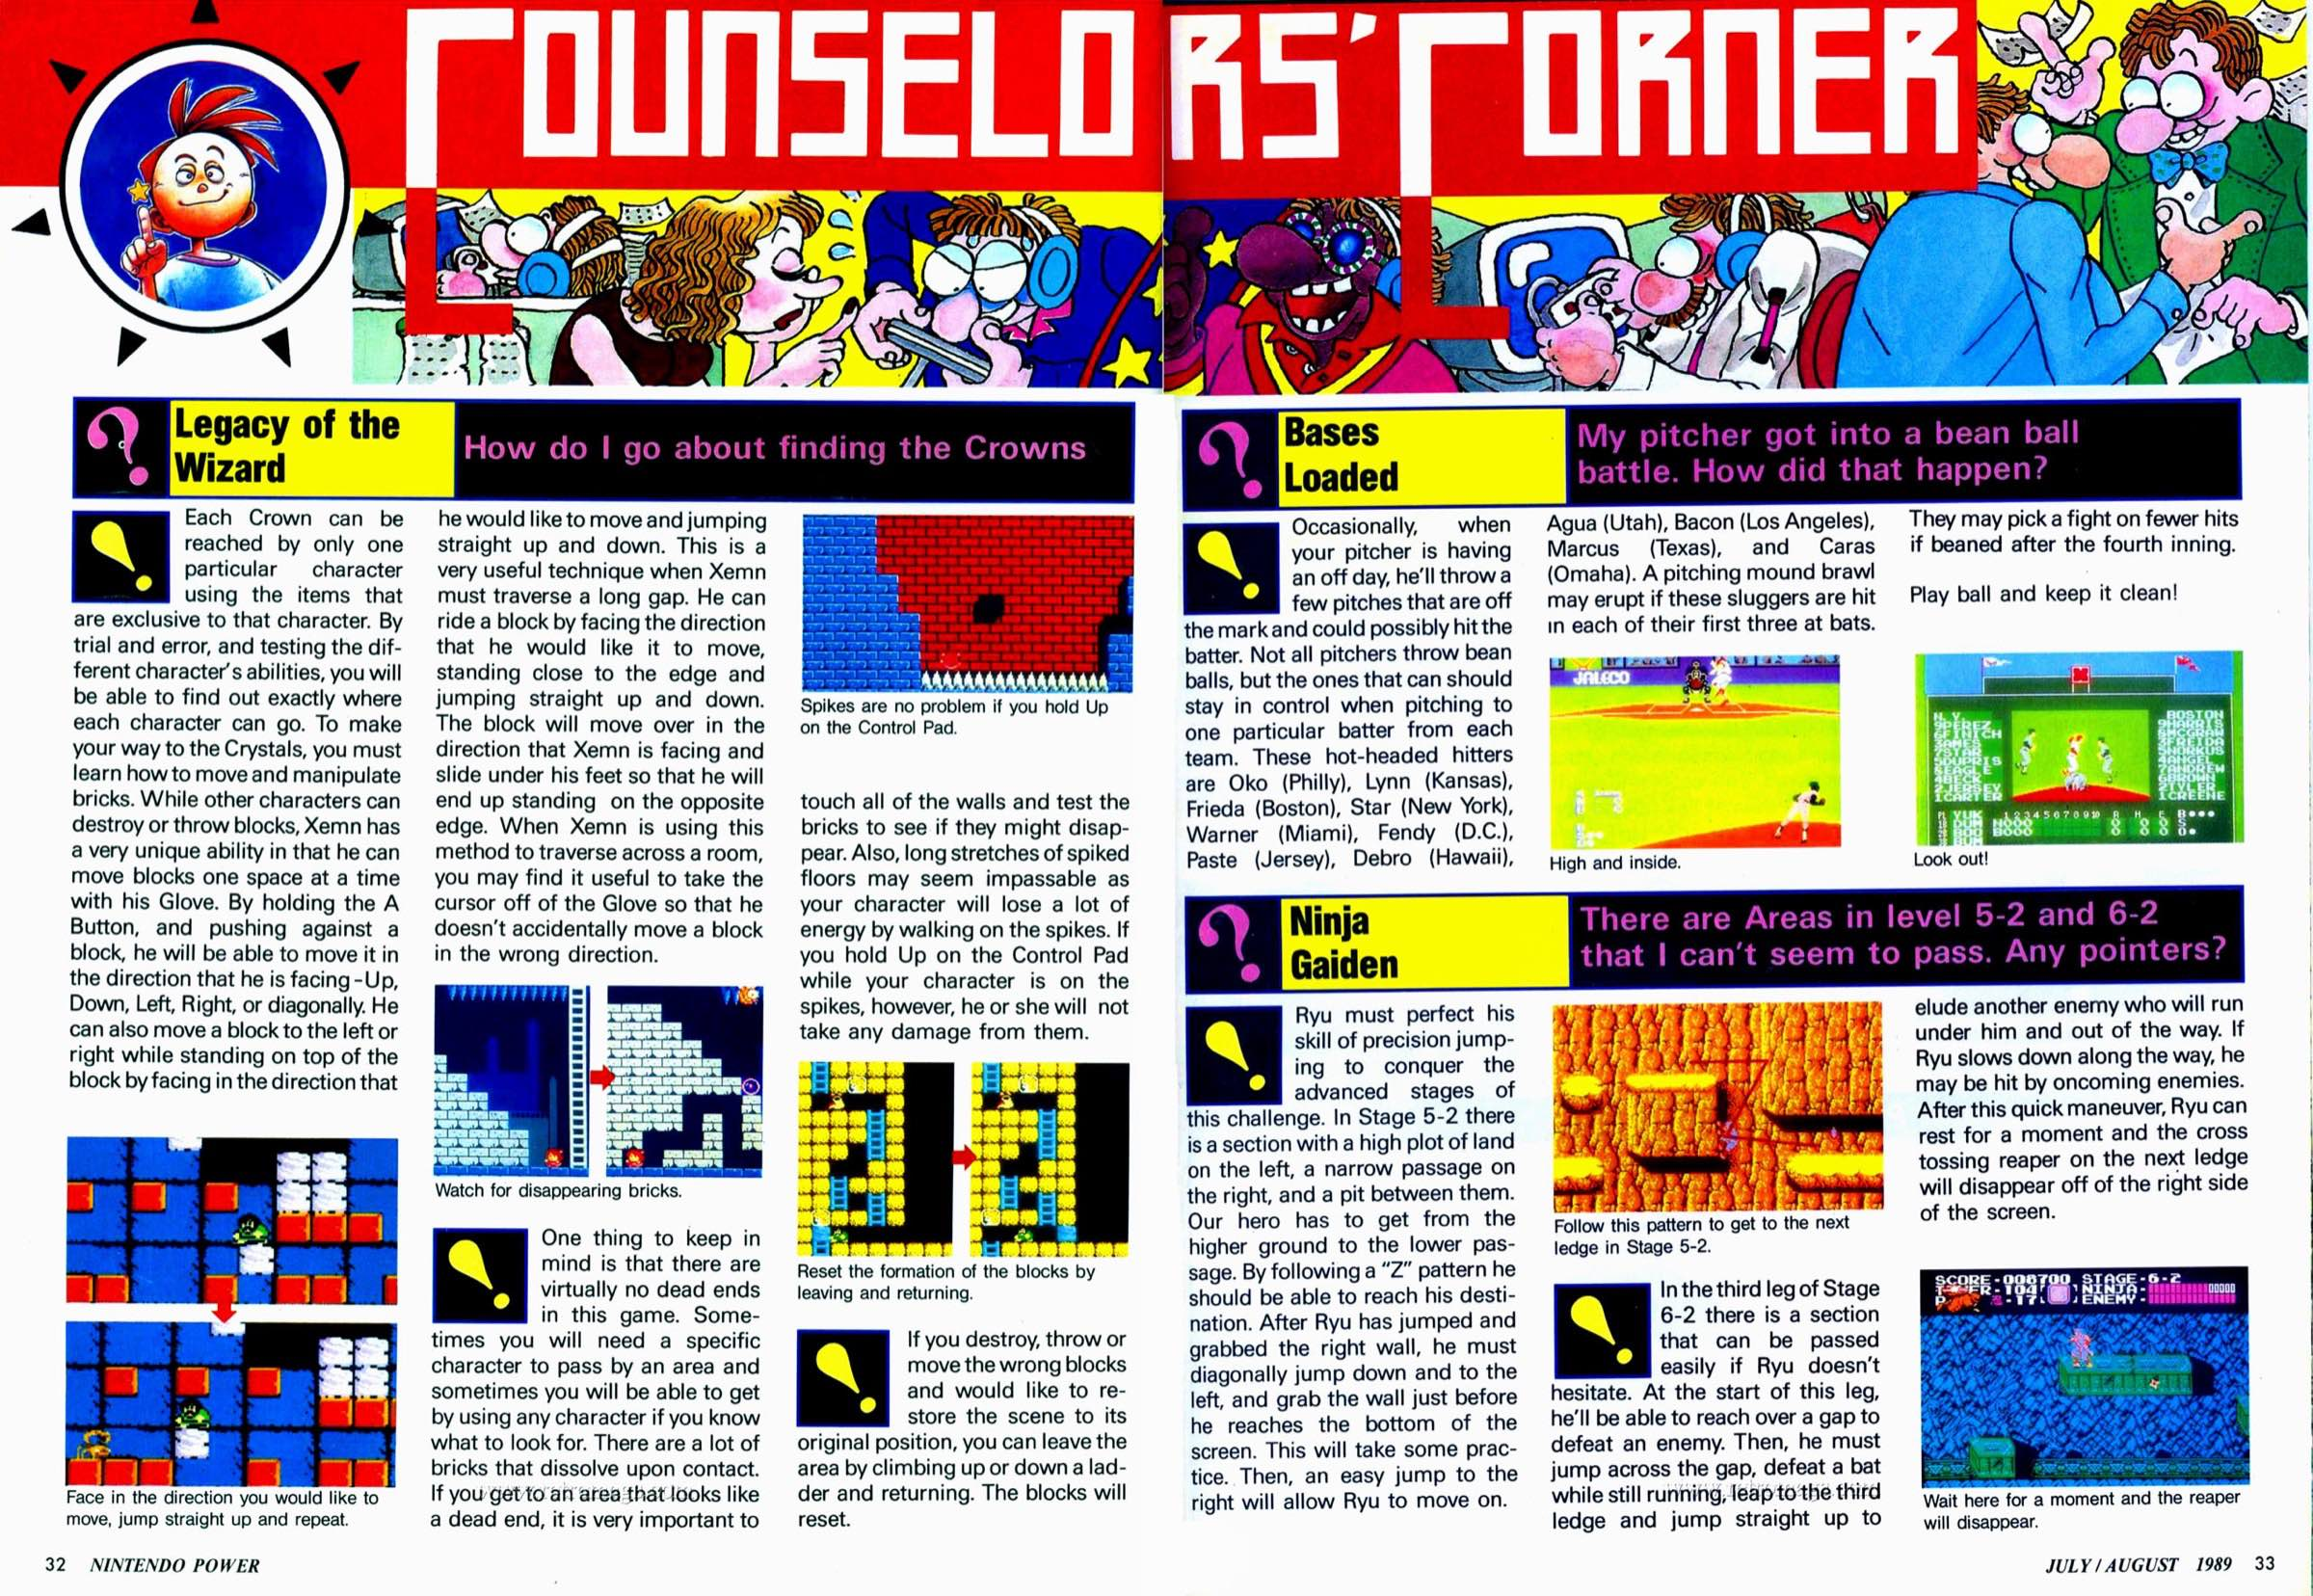 Nintendo Power | July August 1989 p32-33